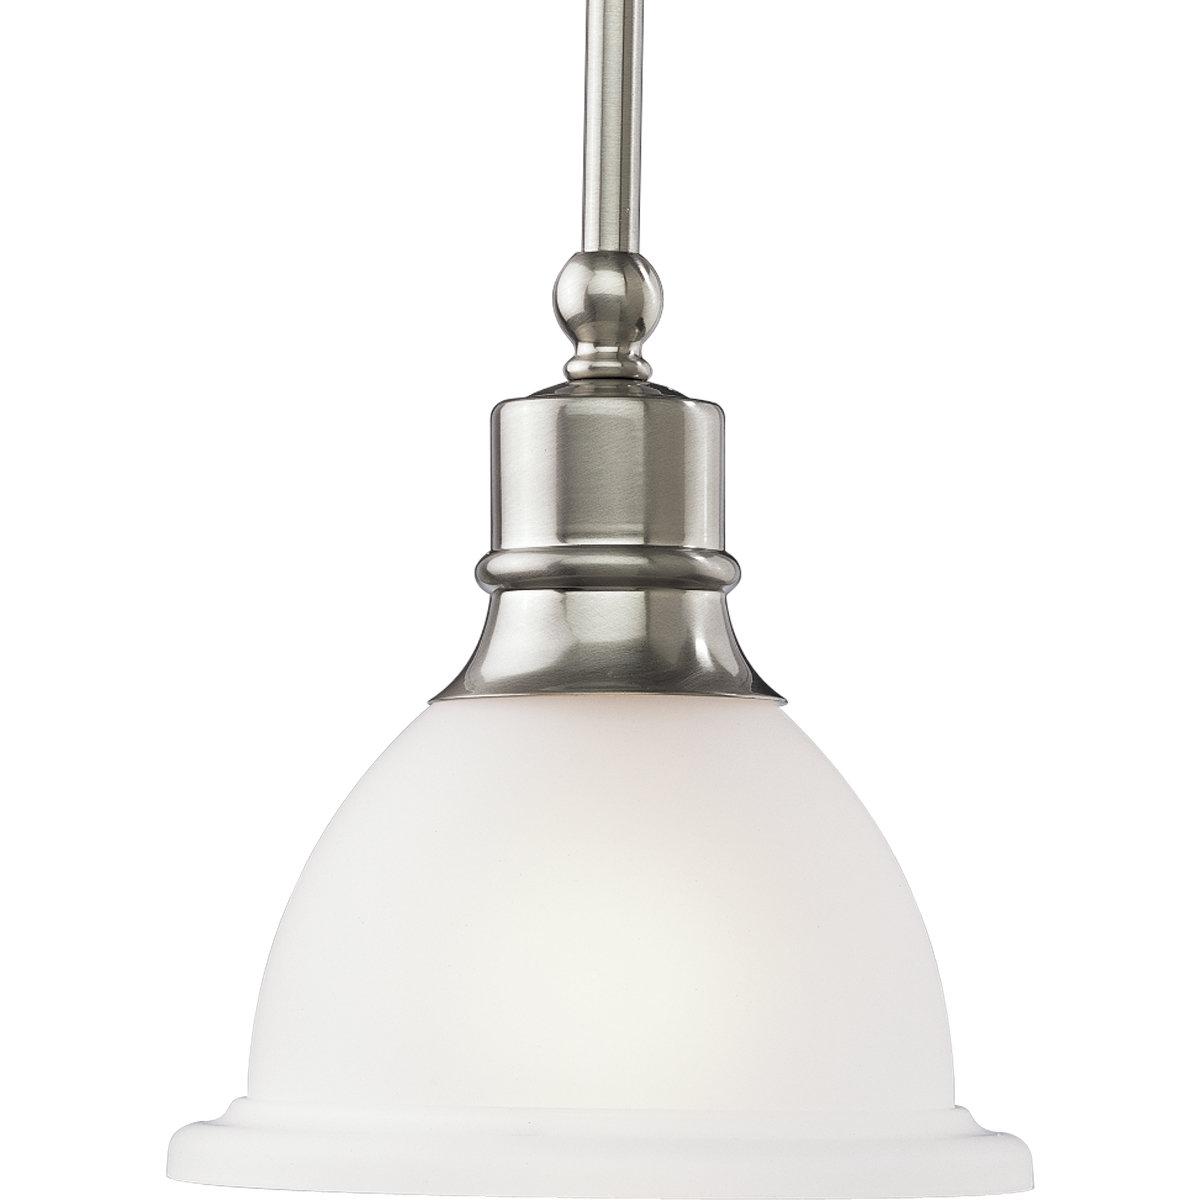 Vangorder 1 Light Single Bell Pendant Within Most Recent Macon 1 Light Single Dome Pendants (Gallery 22 of 25)